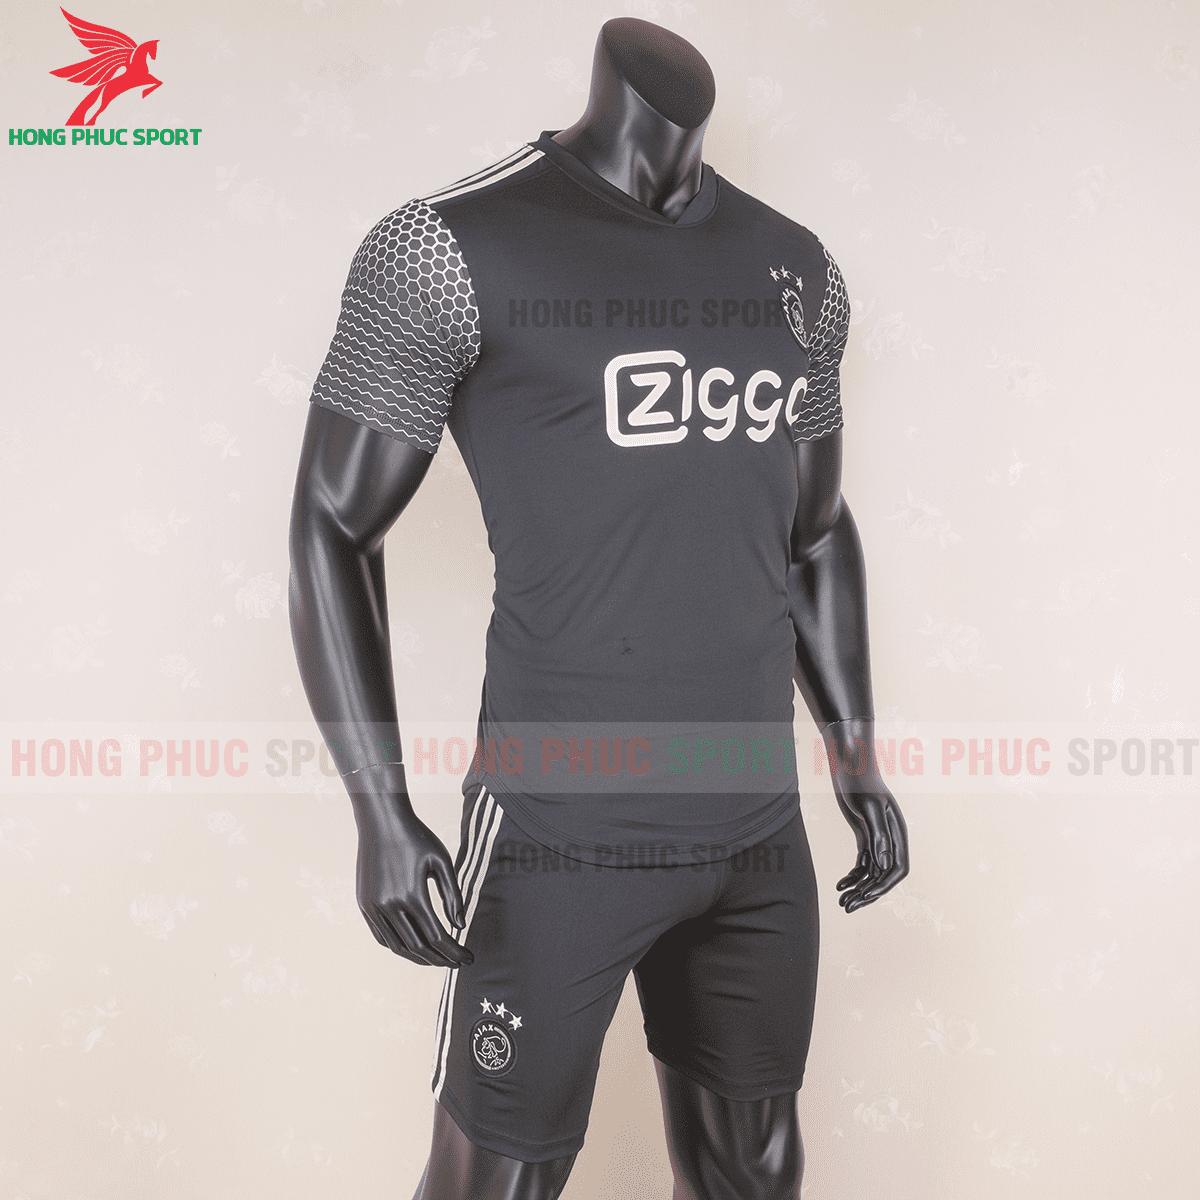 Áo đấu Ajax Amsterdam 2020 2021 mẫu thứ 3(phải)